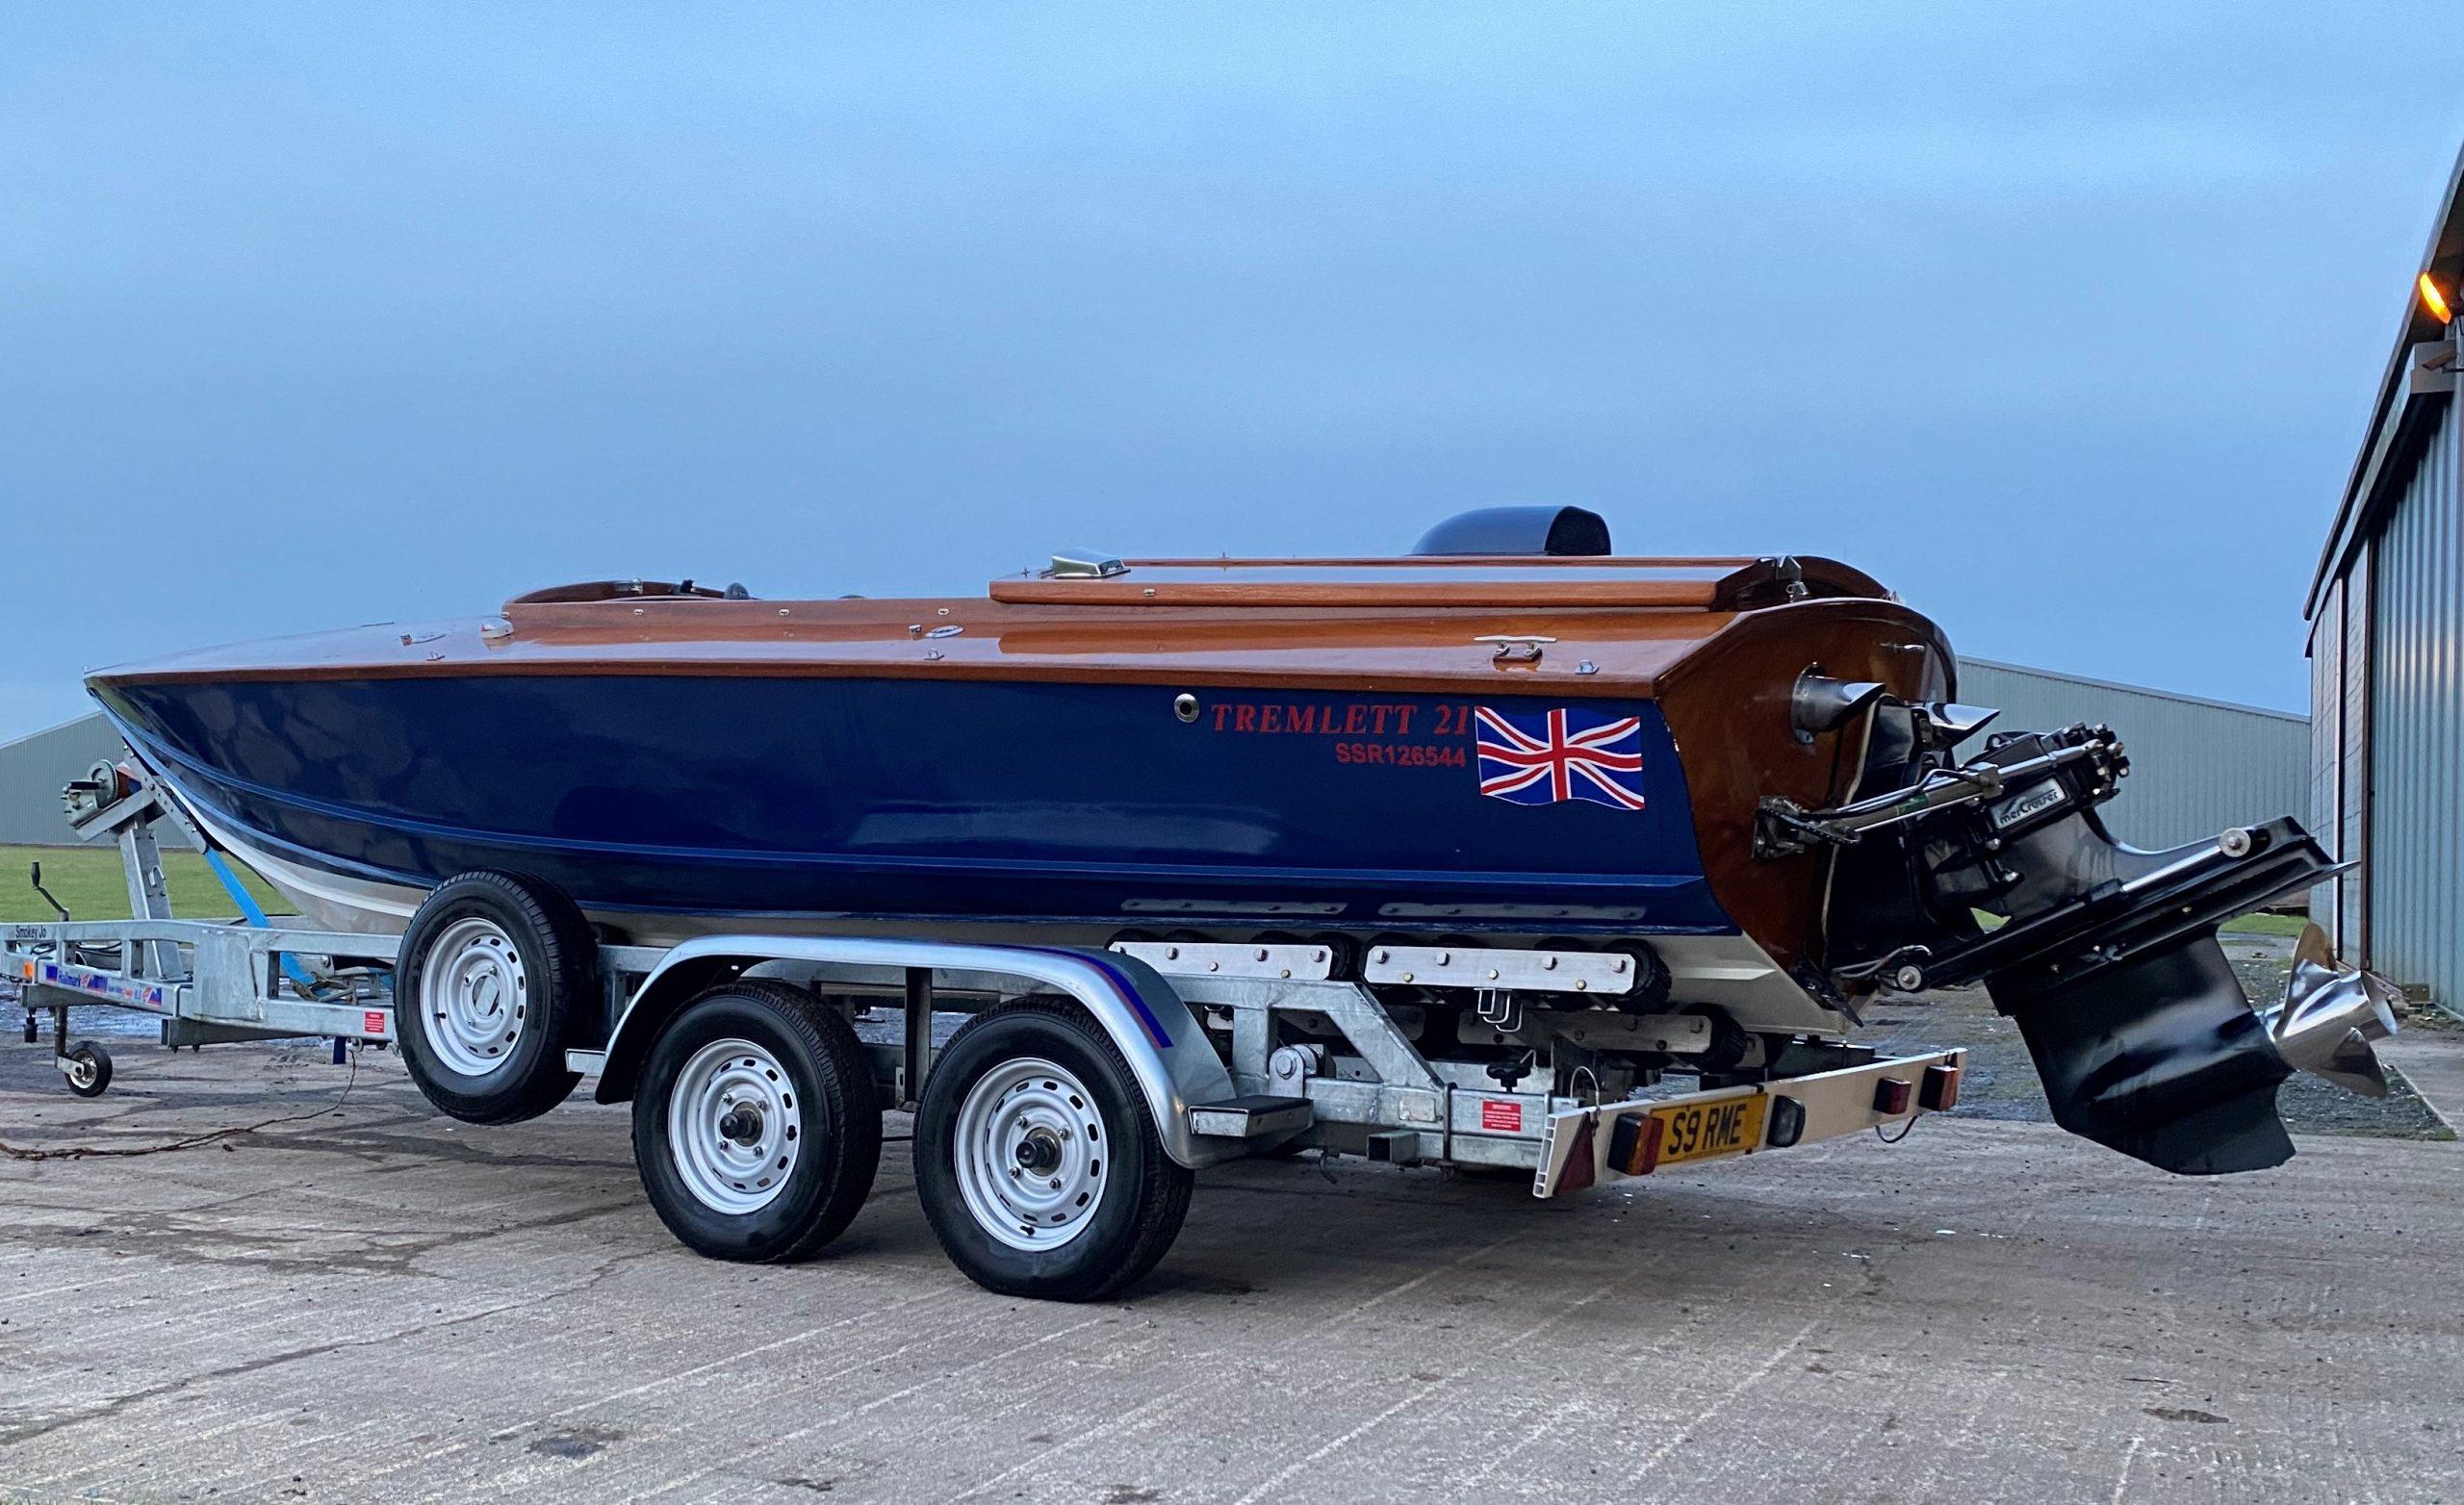 'Smokey Jo' Tremlett Sportsman 21 wooden boat